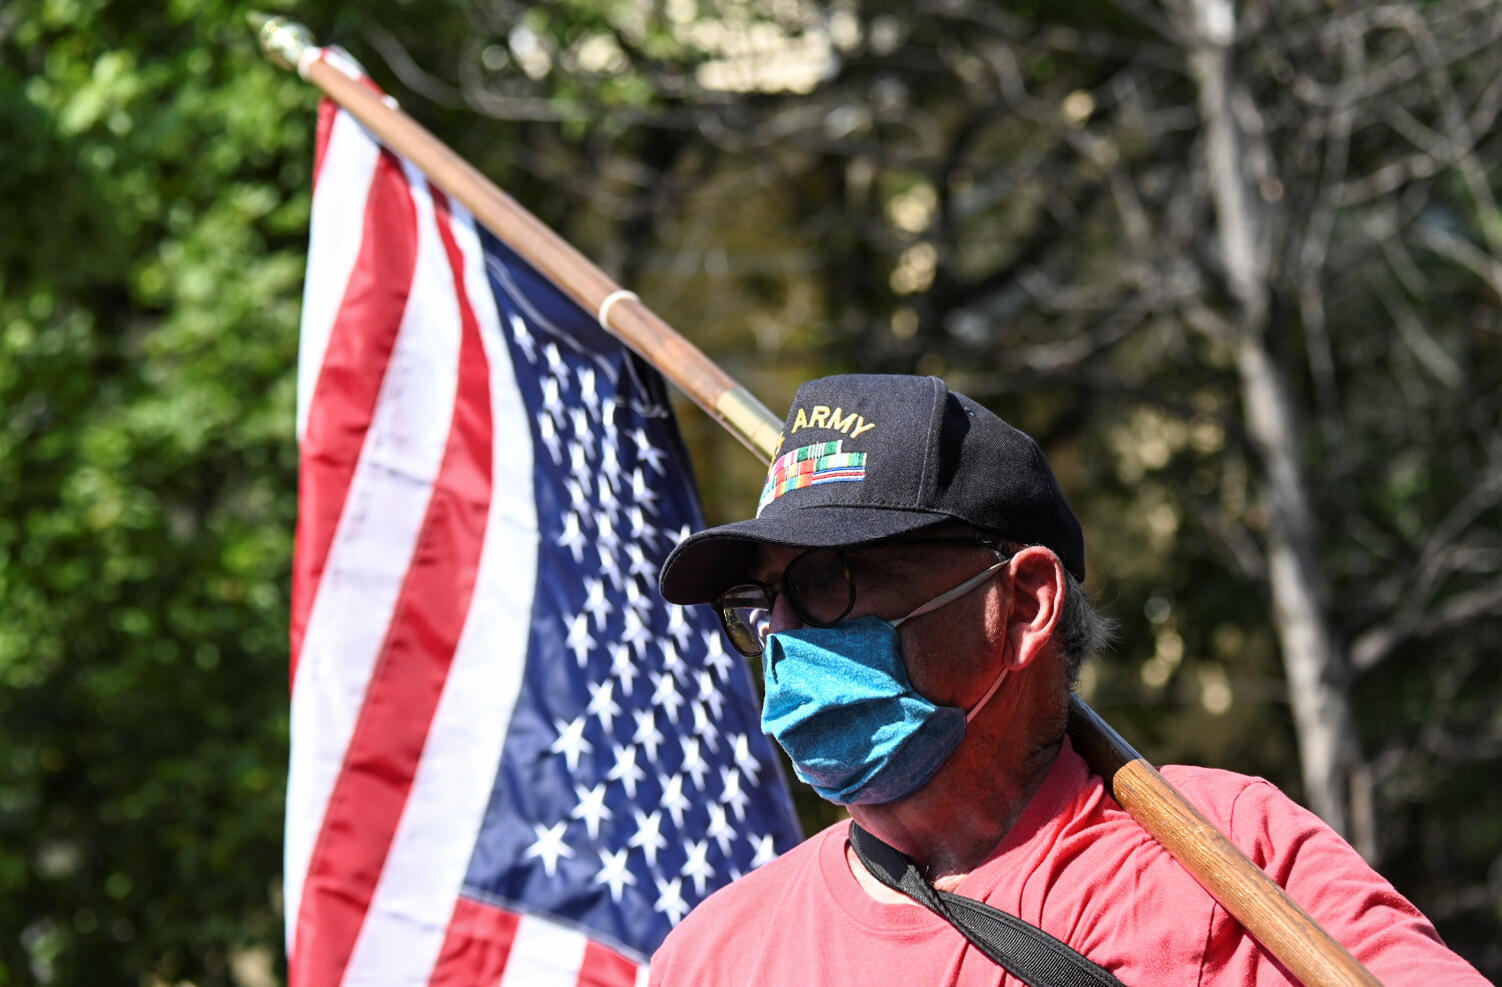 army_veteran_etats_unis_protestation_mort_floyd